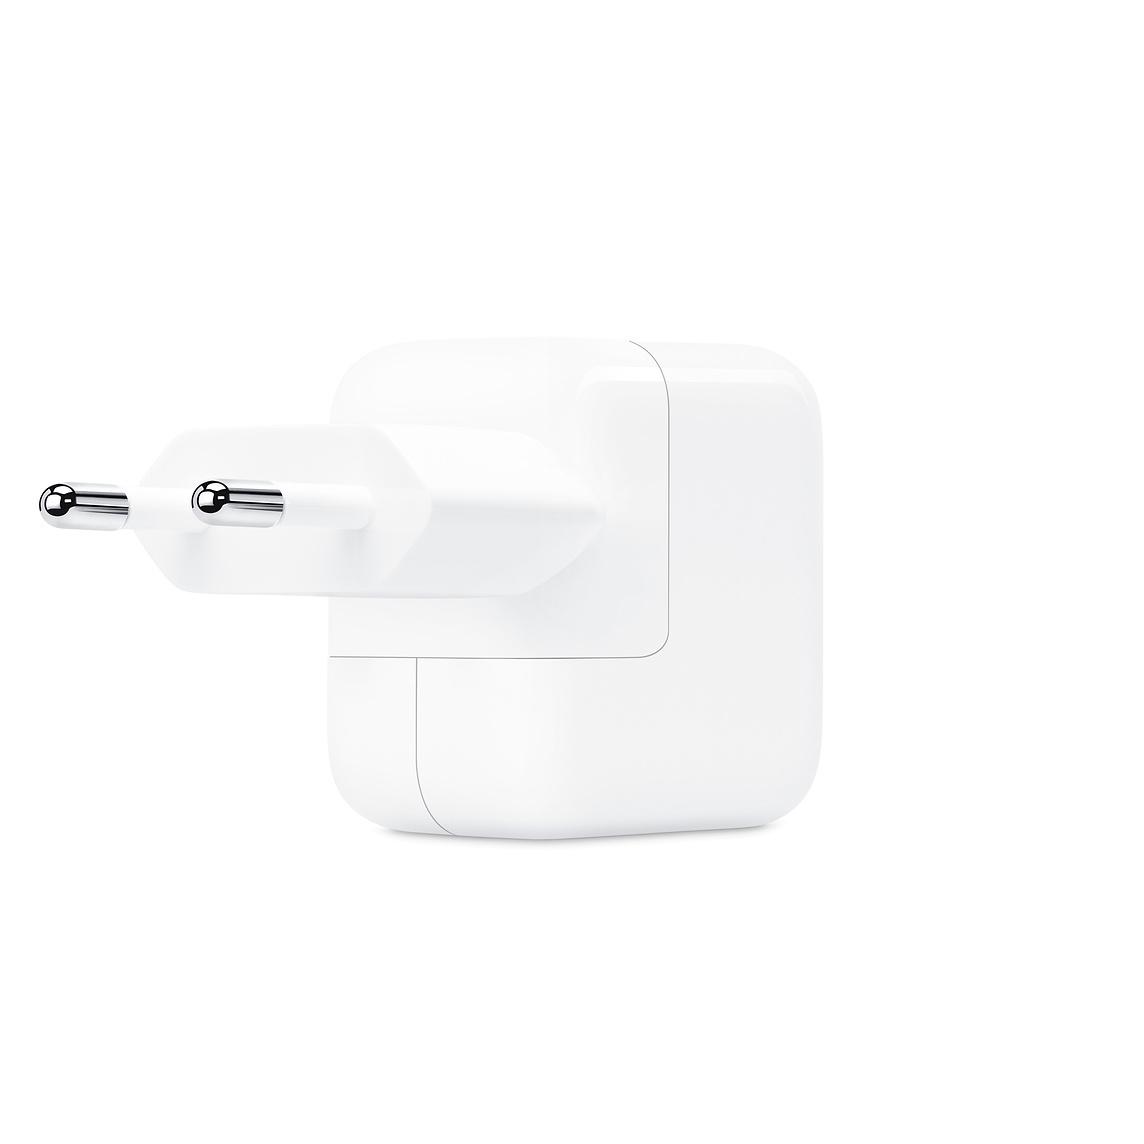 Адаптер питания Apple USB мощностью 12 Вт